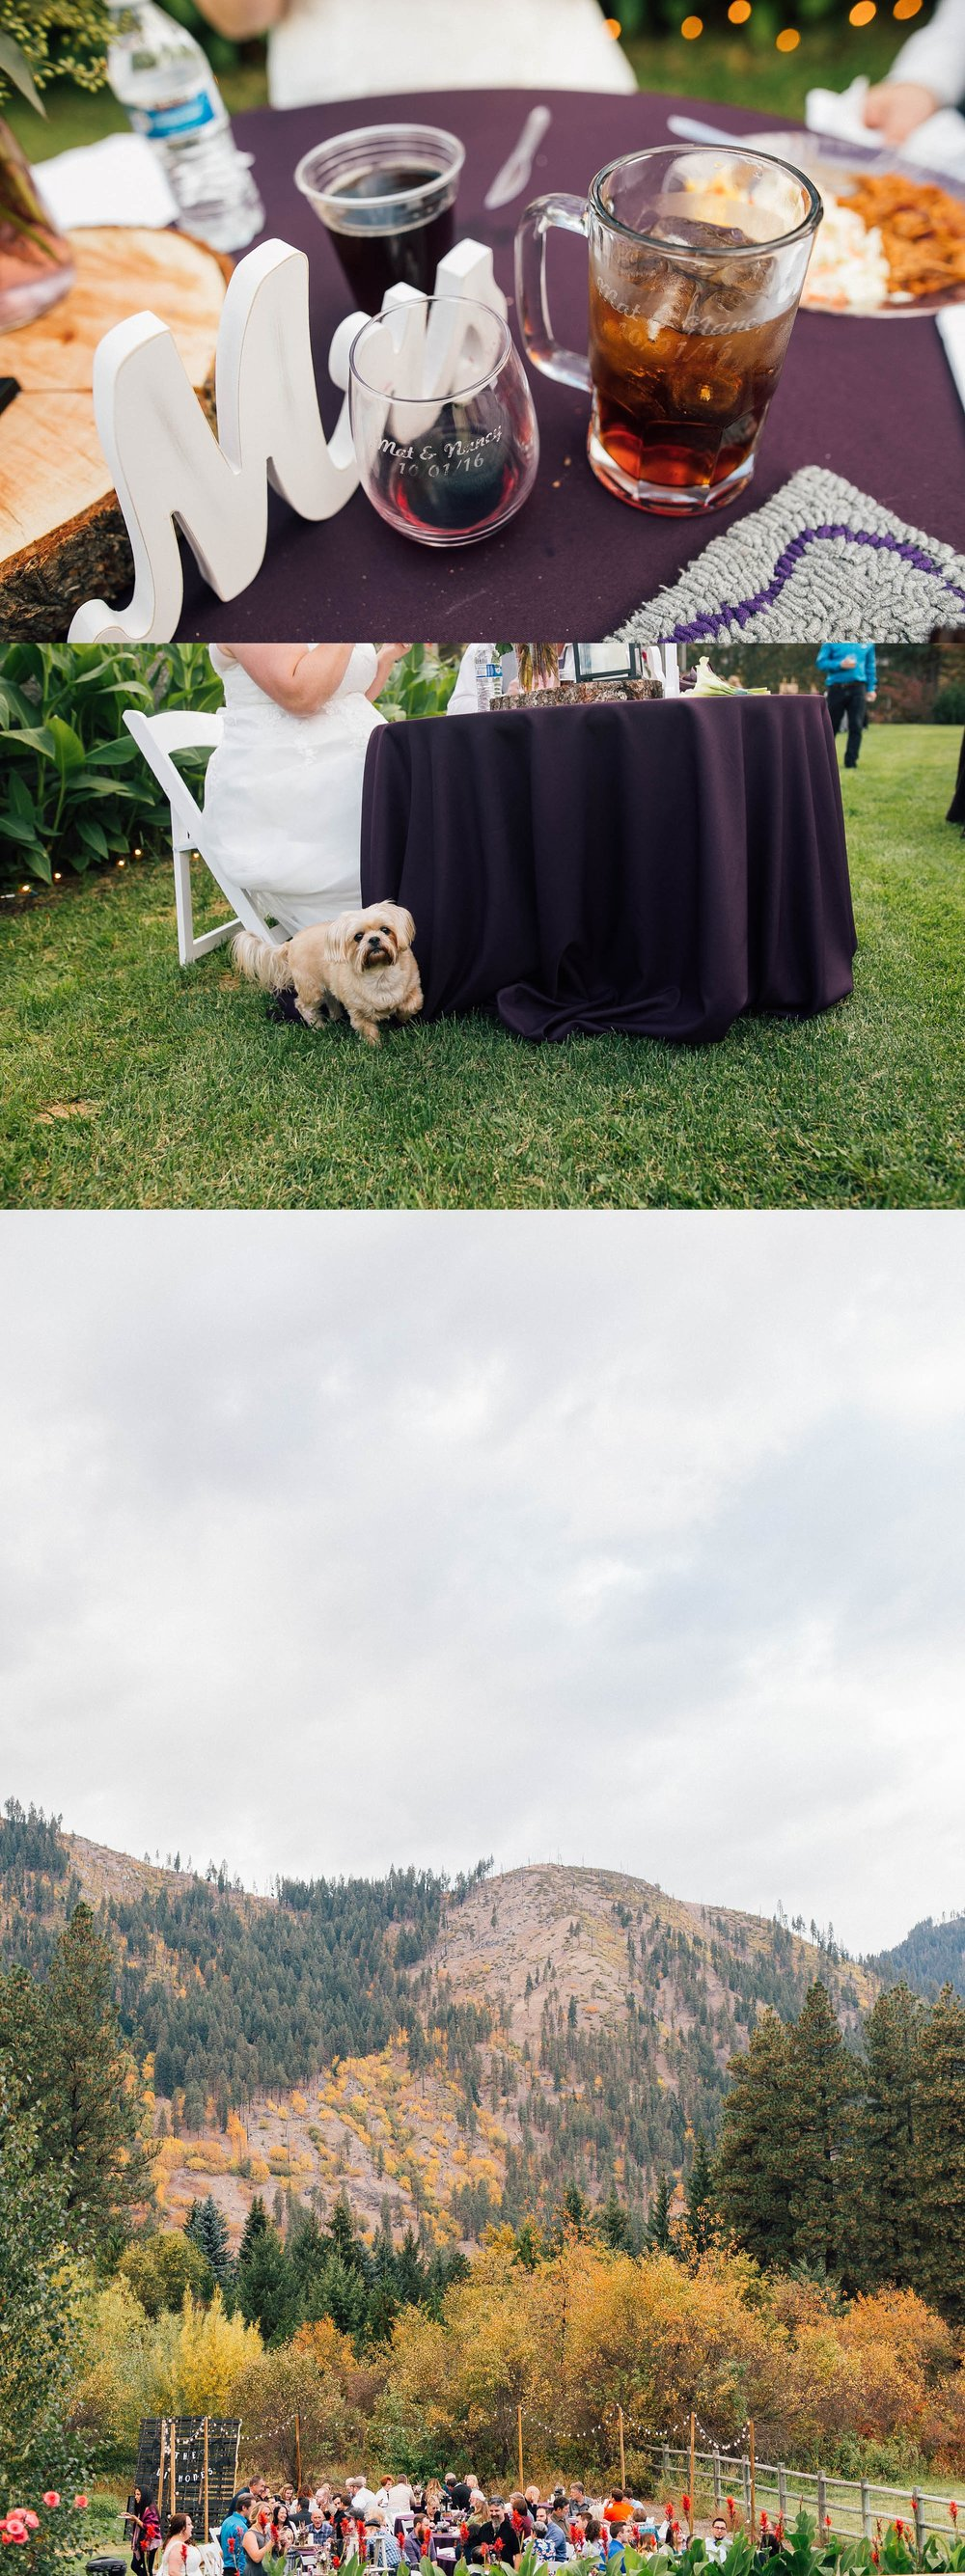 ashley_vos_seattle_ wedding_photographer_0237.jpg